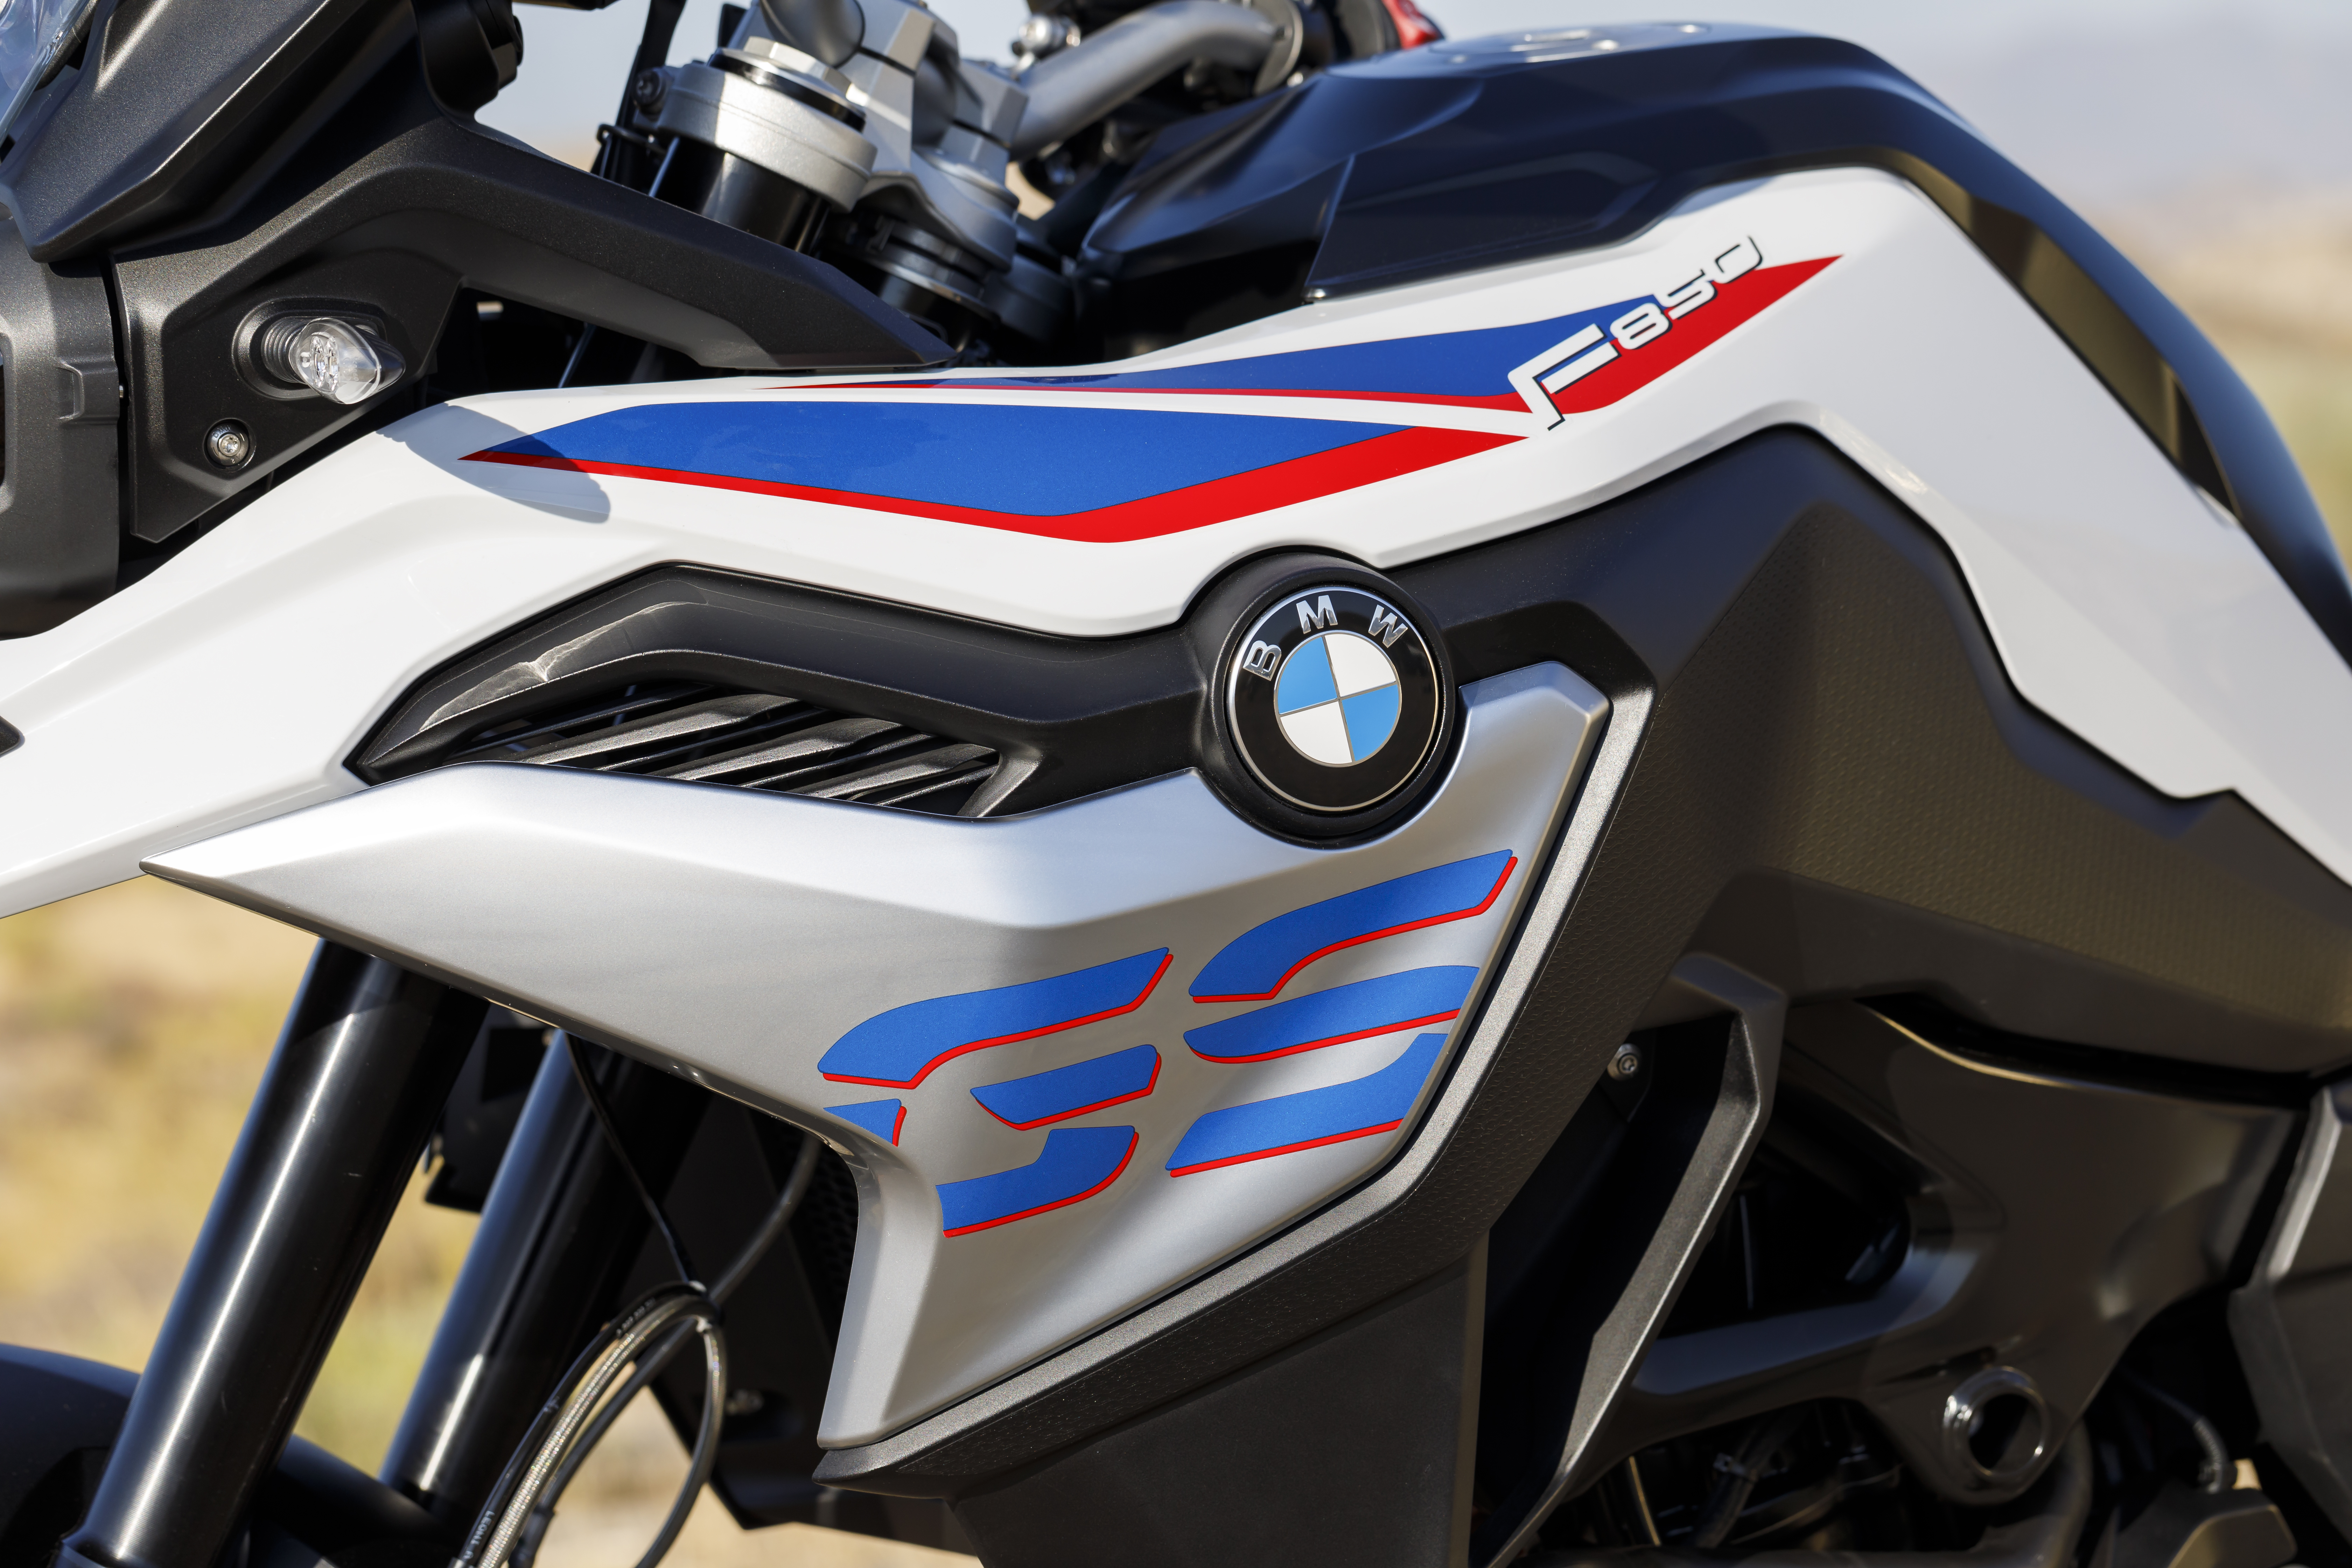 Prueba BMW 850 GS 2018 presentación MotorADN fotos prensa (76)